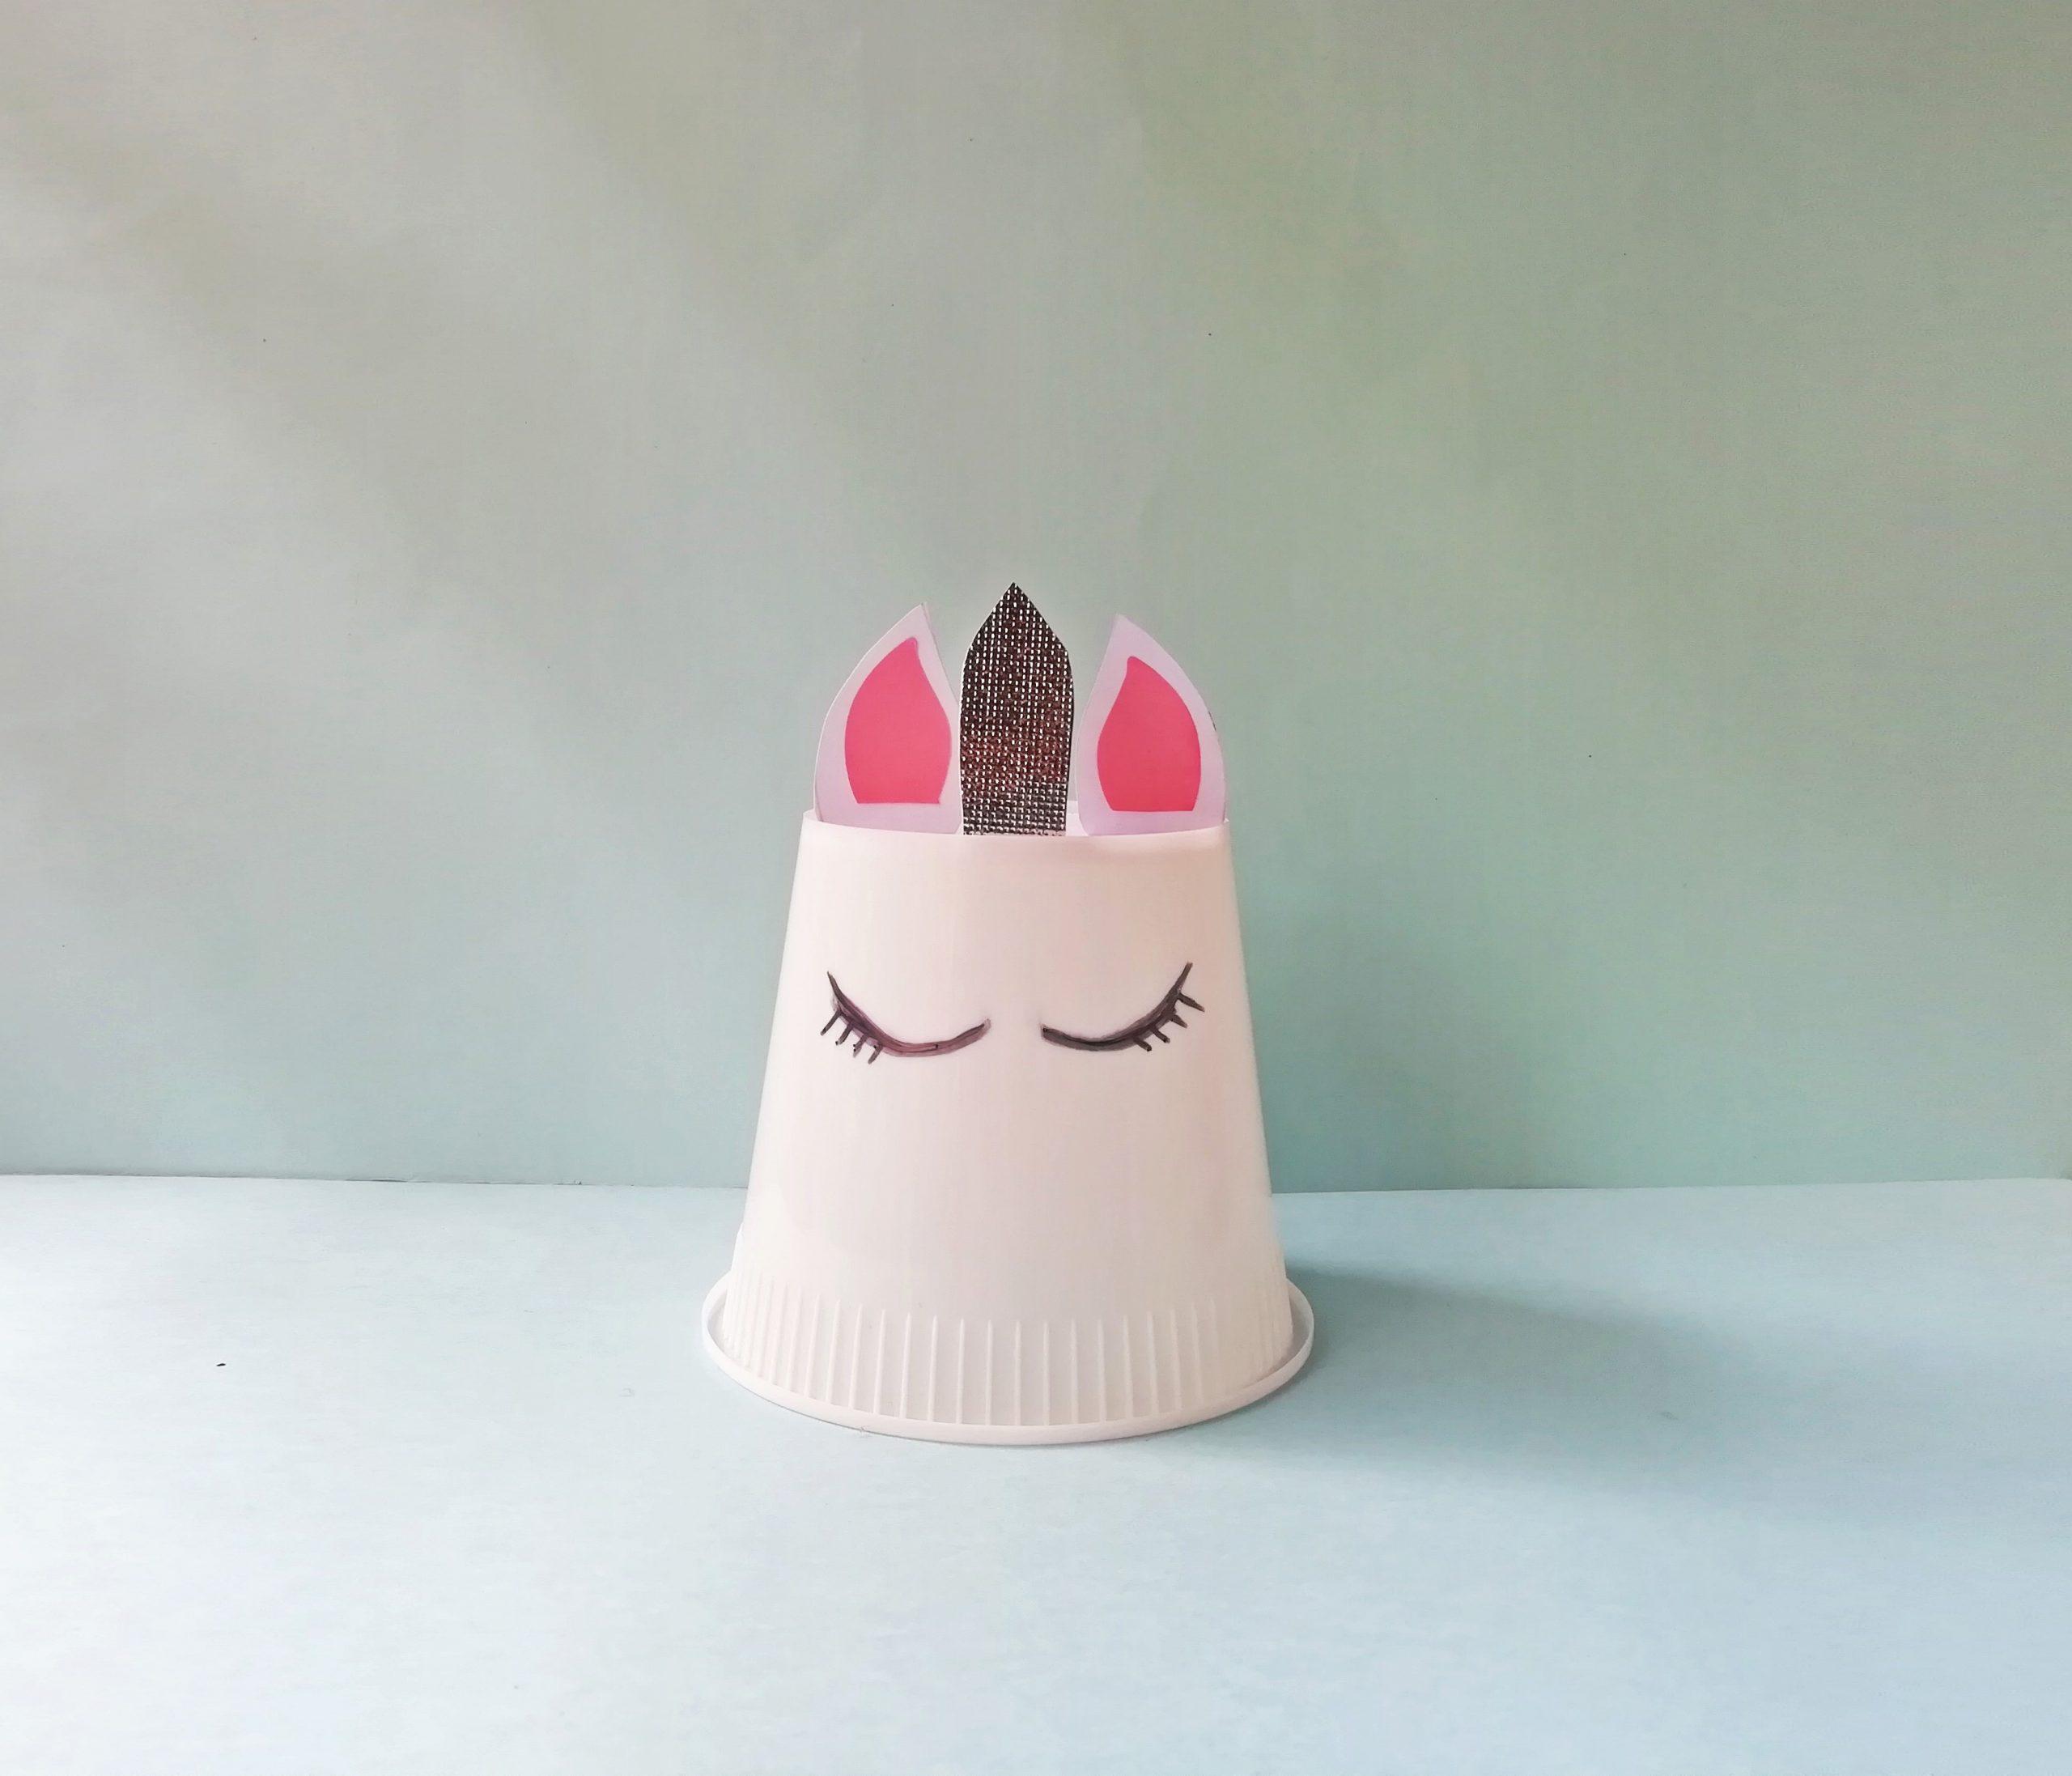 procedimiento paso a paso de unicornio cup craft